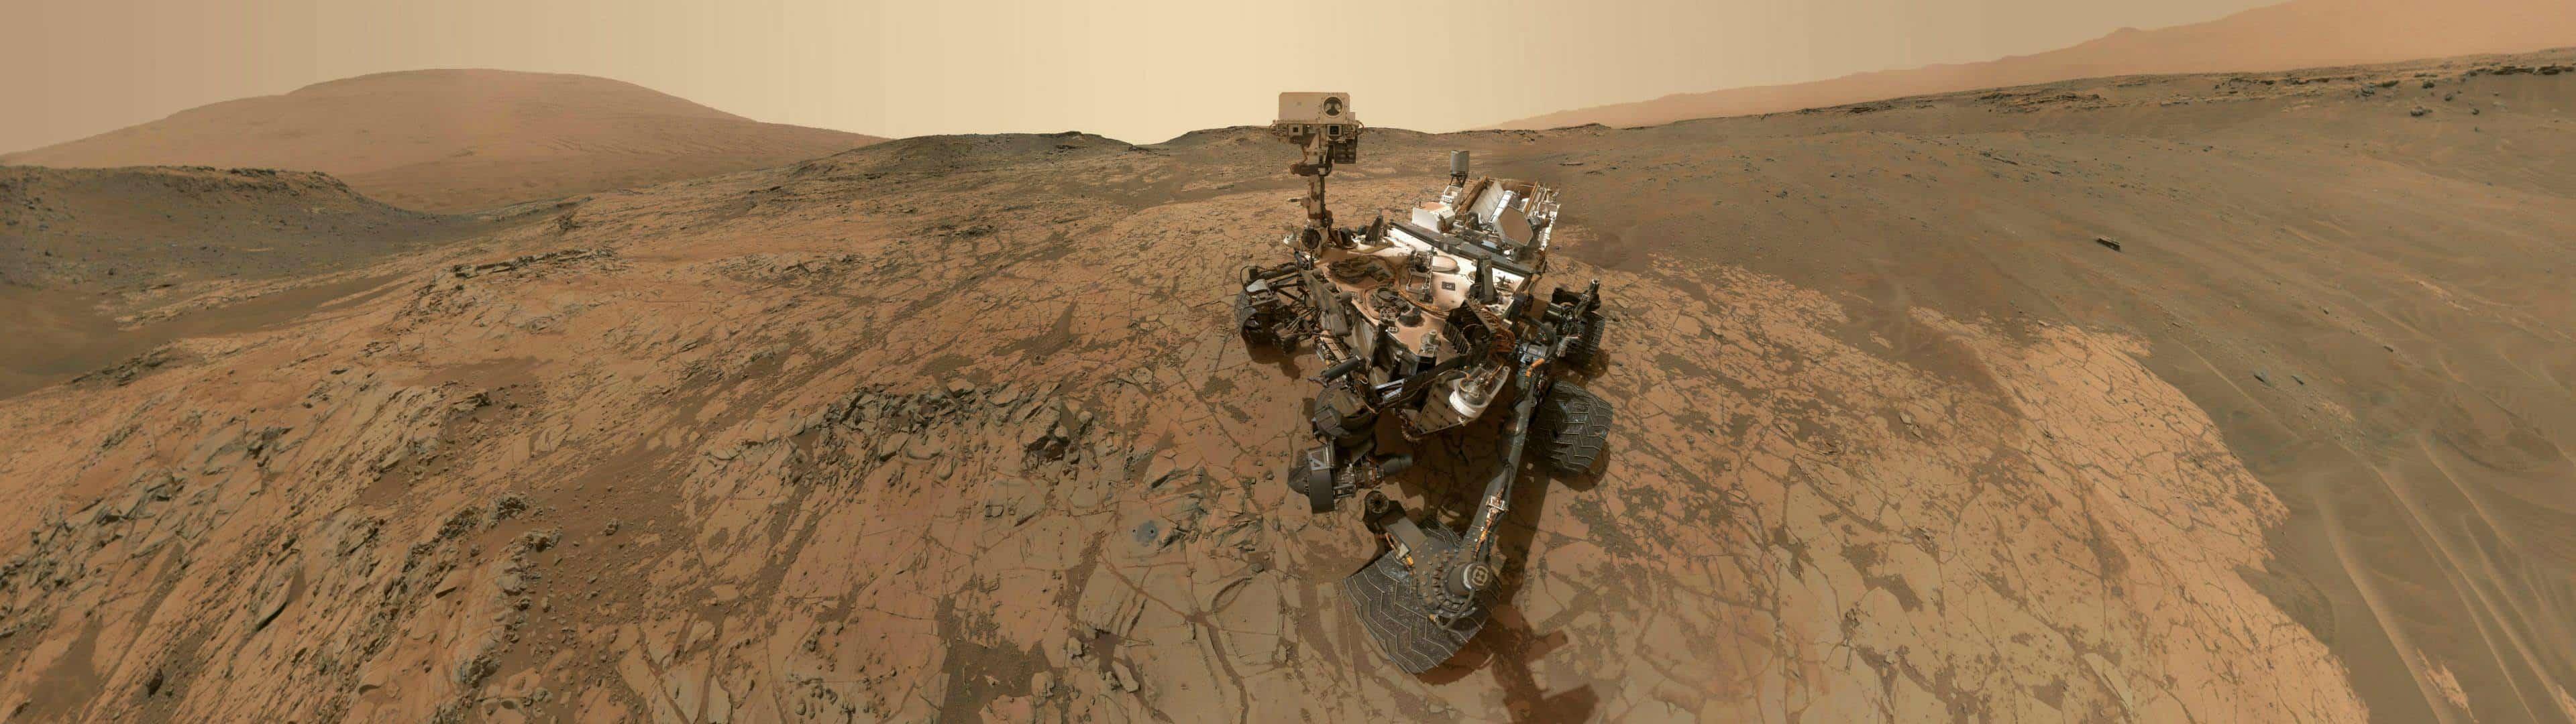 mars curiosity rover dual monitor wallpaper